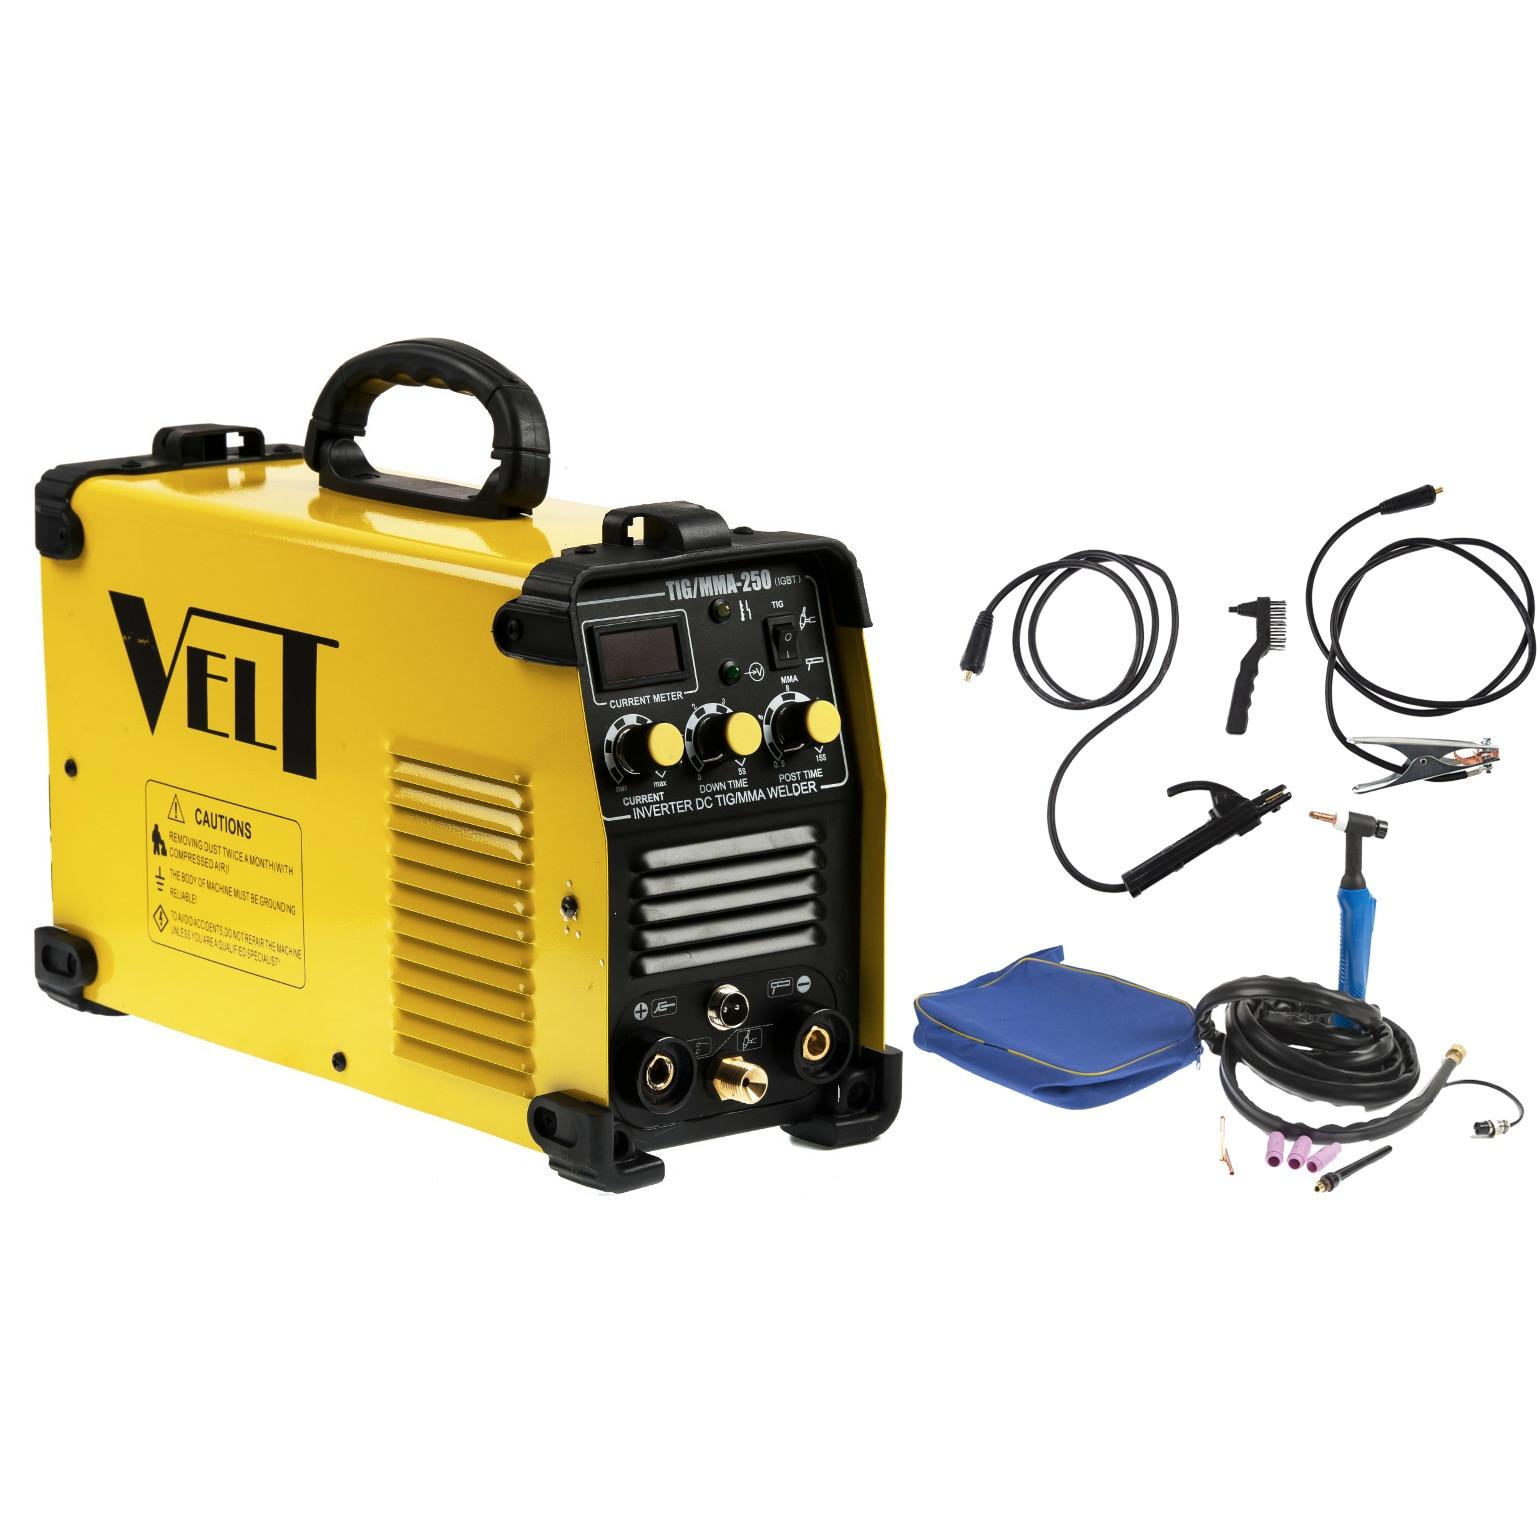 Fotografie Invertor de sudura profesional Velt TIG/MMA 250, 250 A, 230 V, electrod 1.6-5 mm, 9.5 kg, accesorii incluse